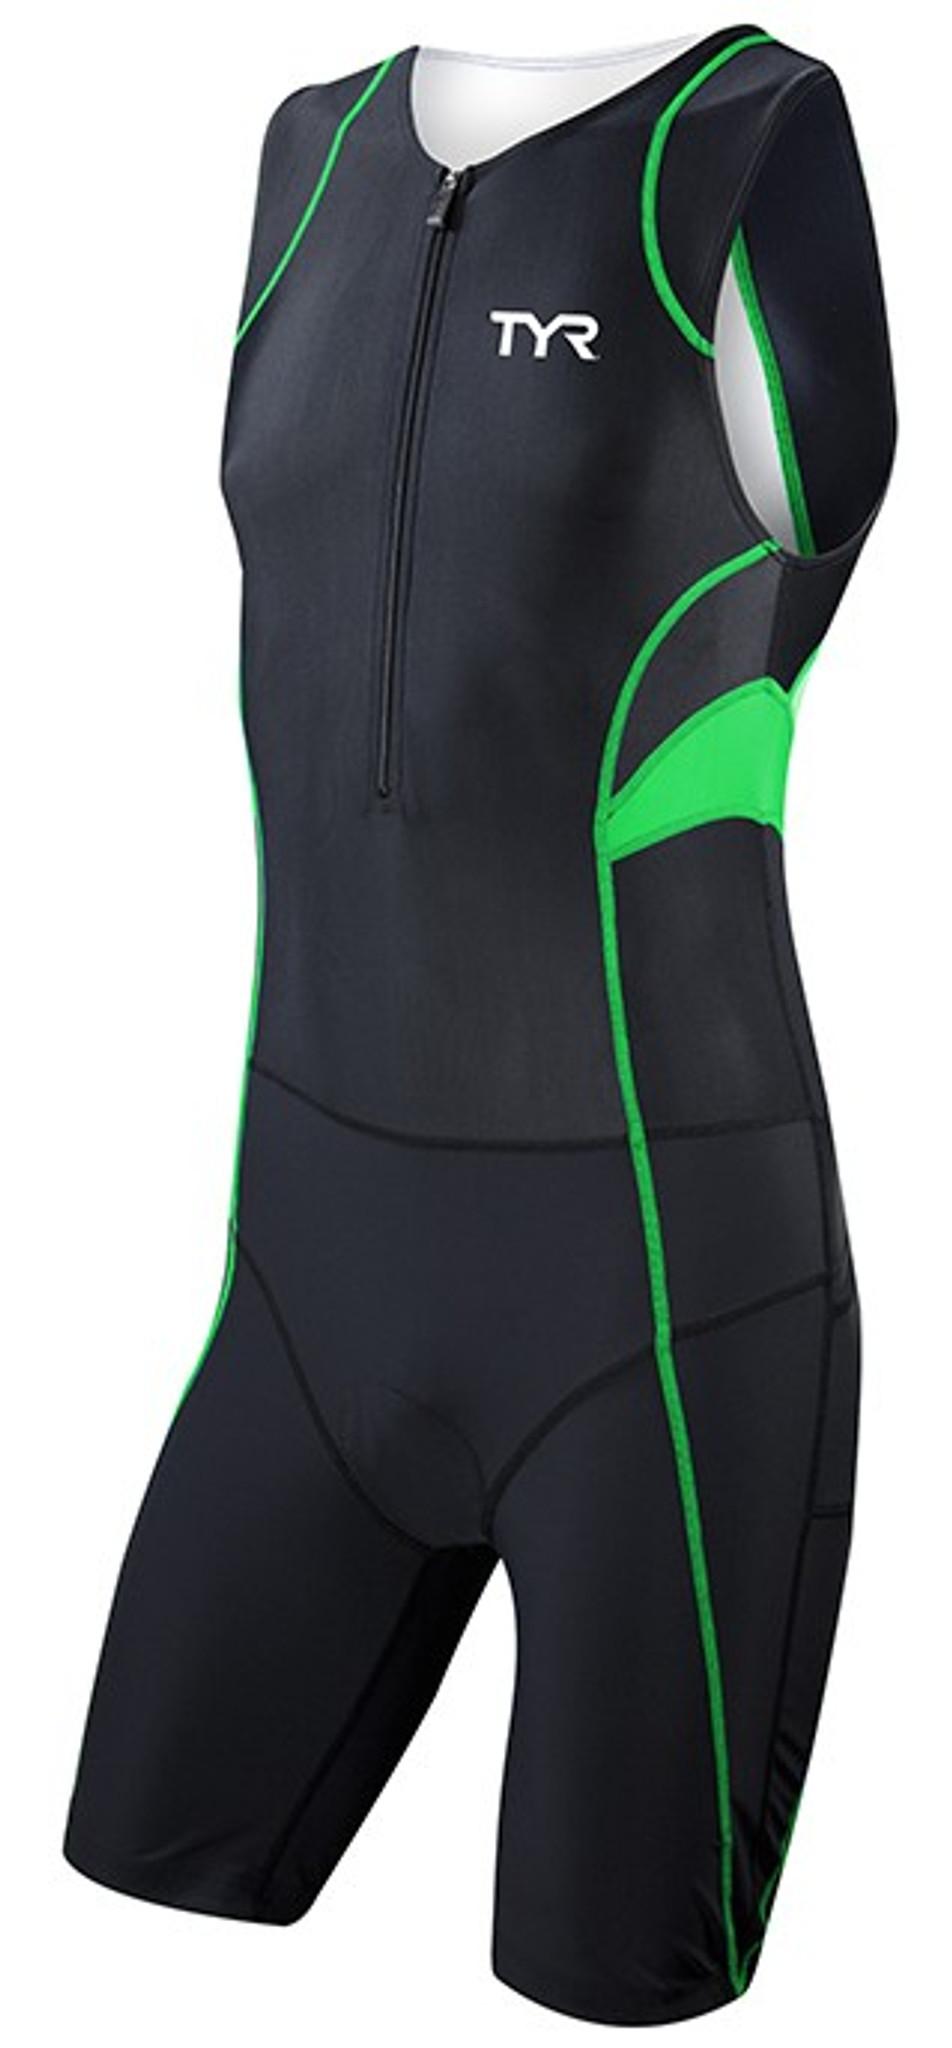 9dd65a6752 MyTriathlon - TYR Mens Carbon Zipper Back Short John with Pad